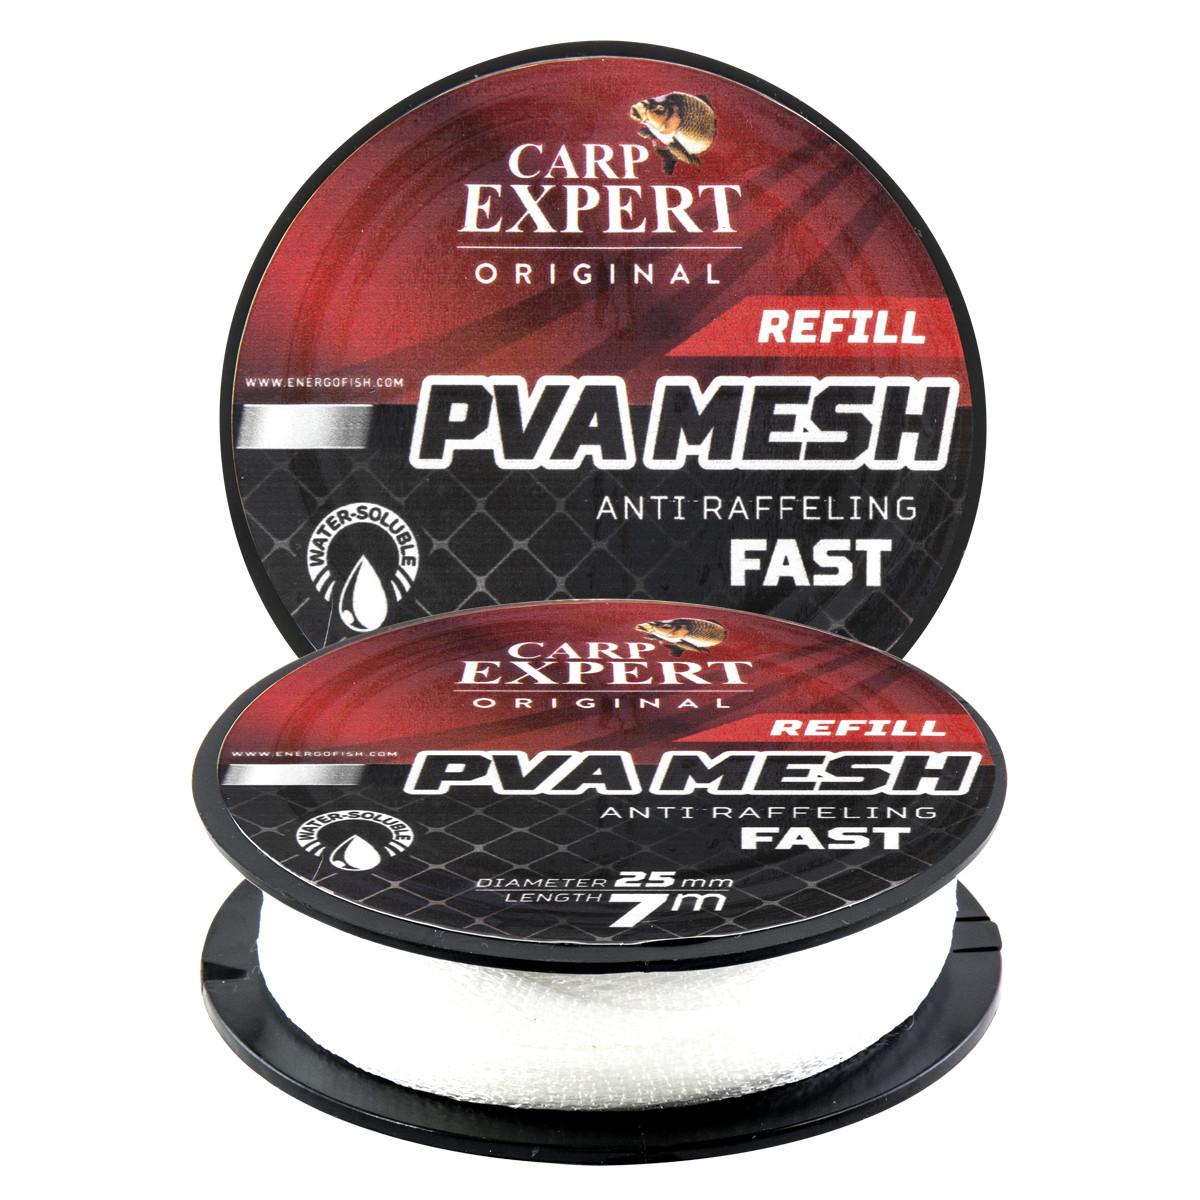 ПВА-сетка для рыбалки 7м 25мм на шпуле Energofish Carp Expert PVA Refill Mesh Anti Raffeling Fast (30141225)